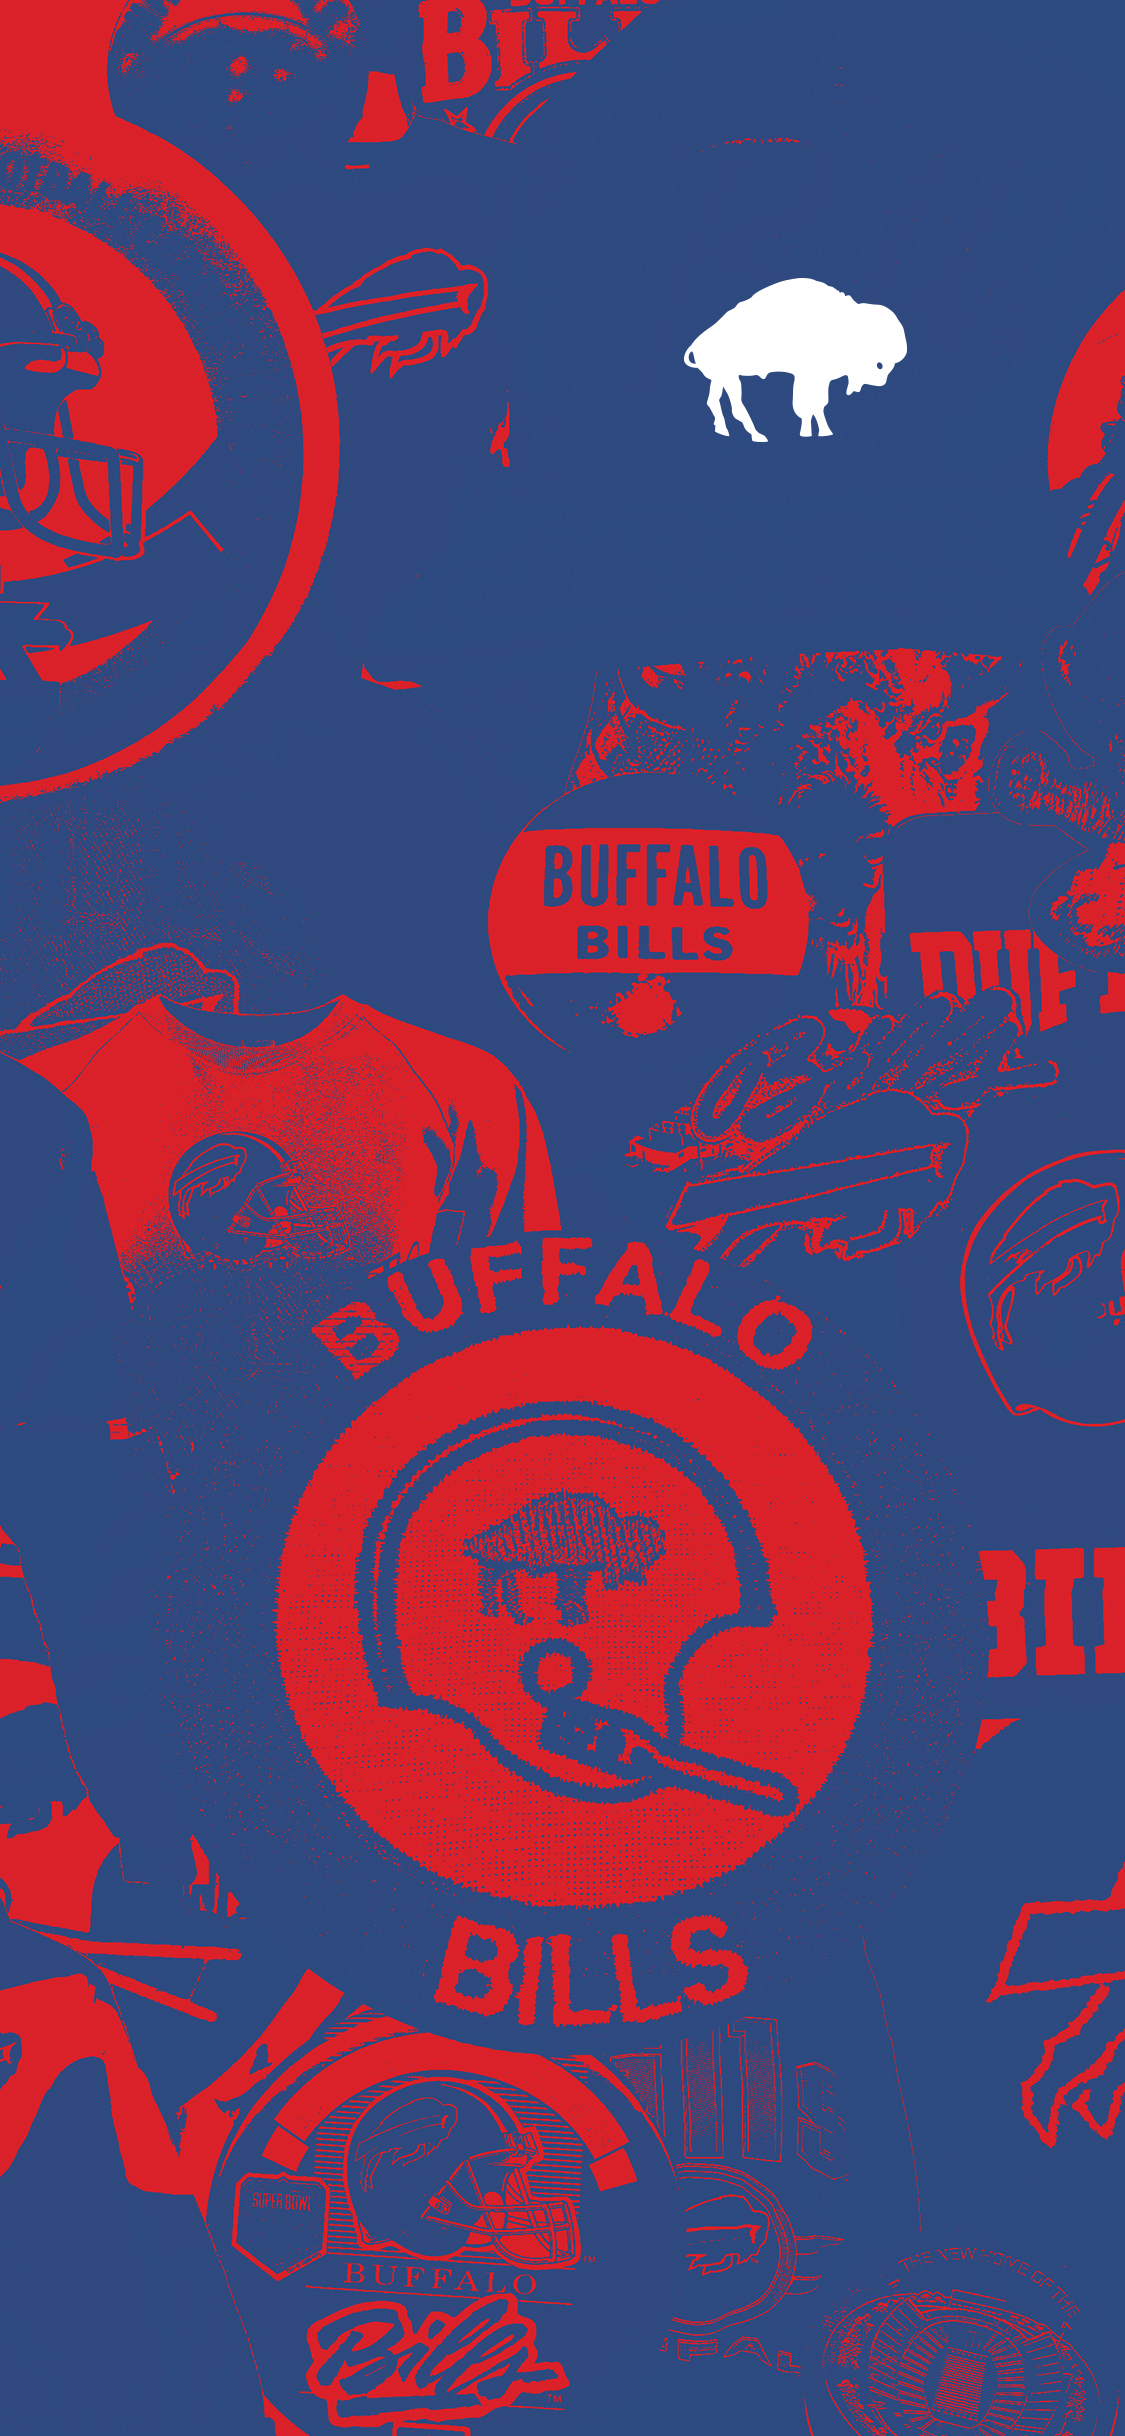 Buffalo Bills Wallpapers | Buffalo Bills - Buffalobills